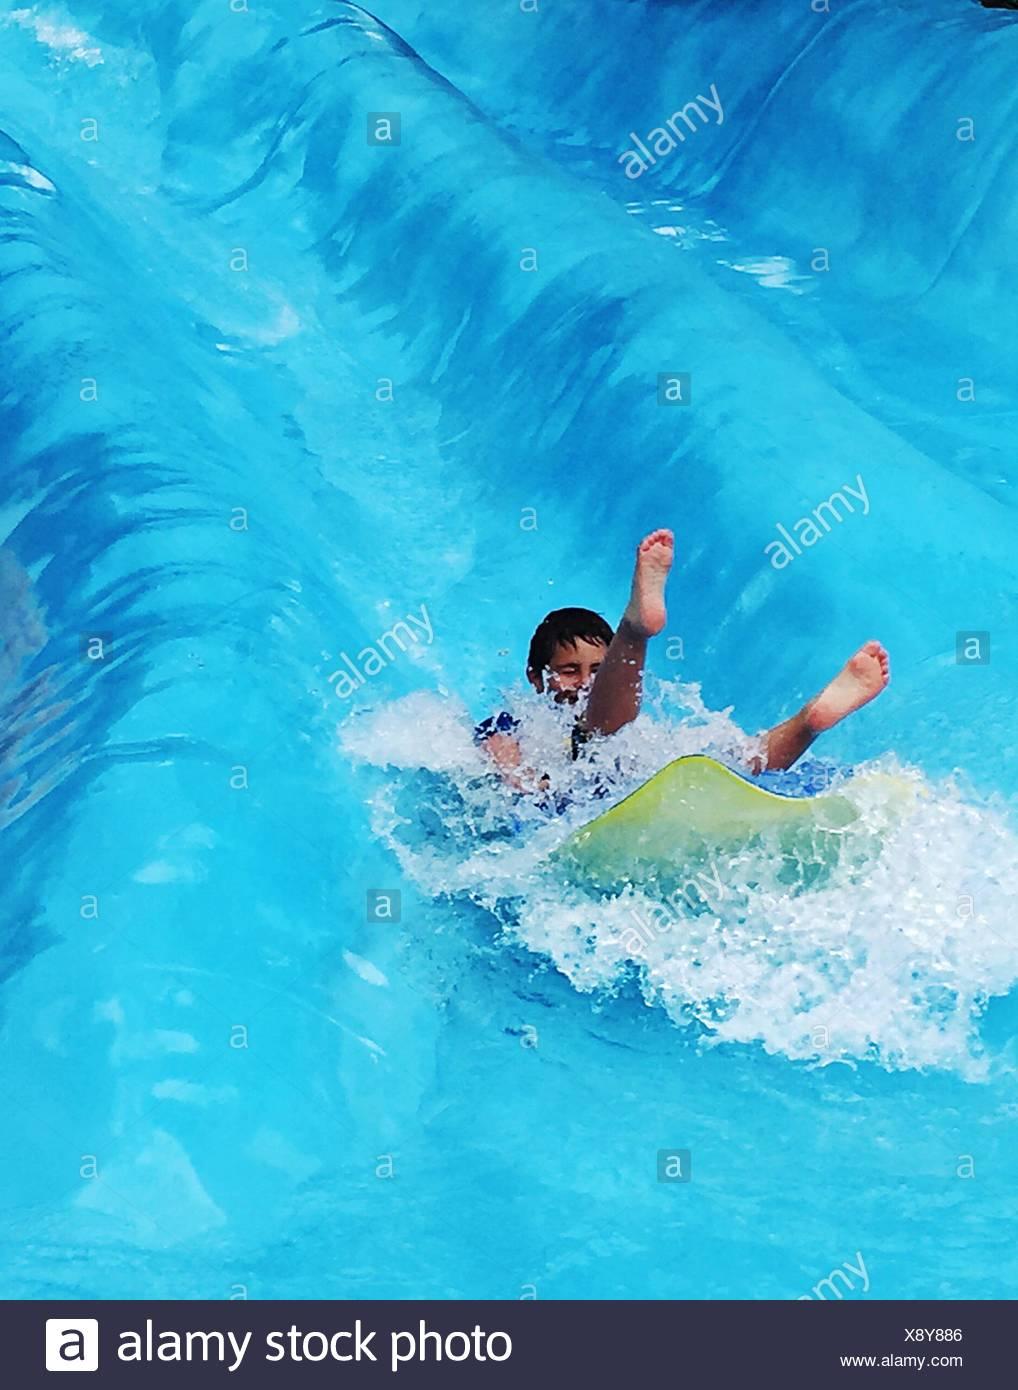 Boy On Water Slide - Stock Image